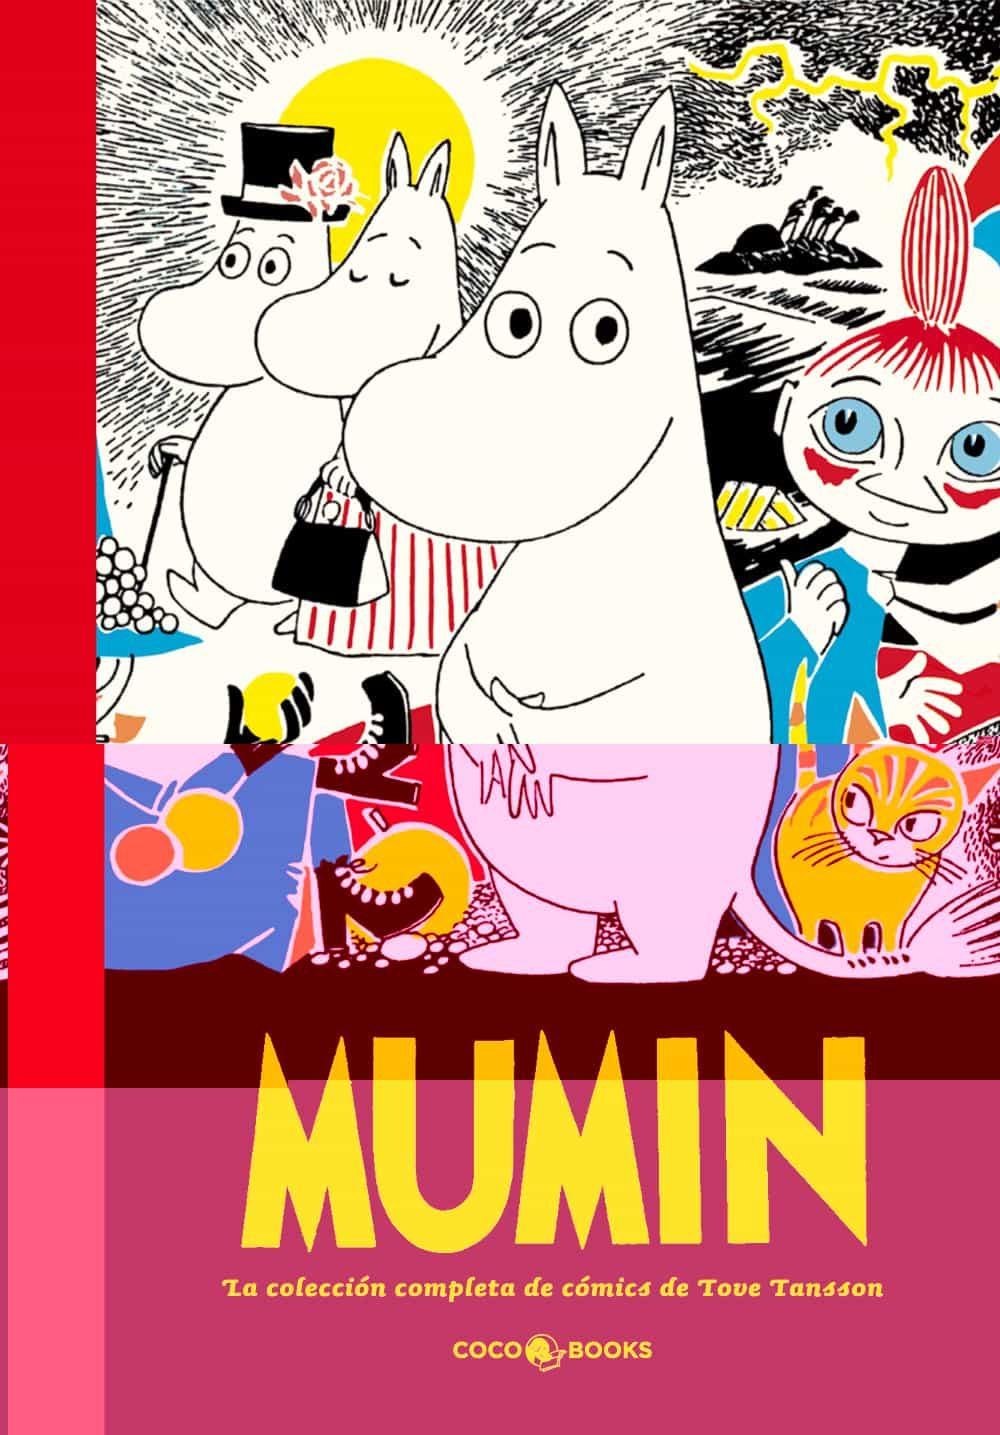 Mumin: La Coleccion Completa De Comics De Tove Jansson (vol. 1) por Tove Jansson